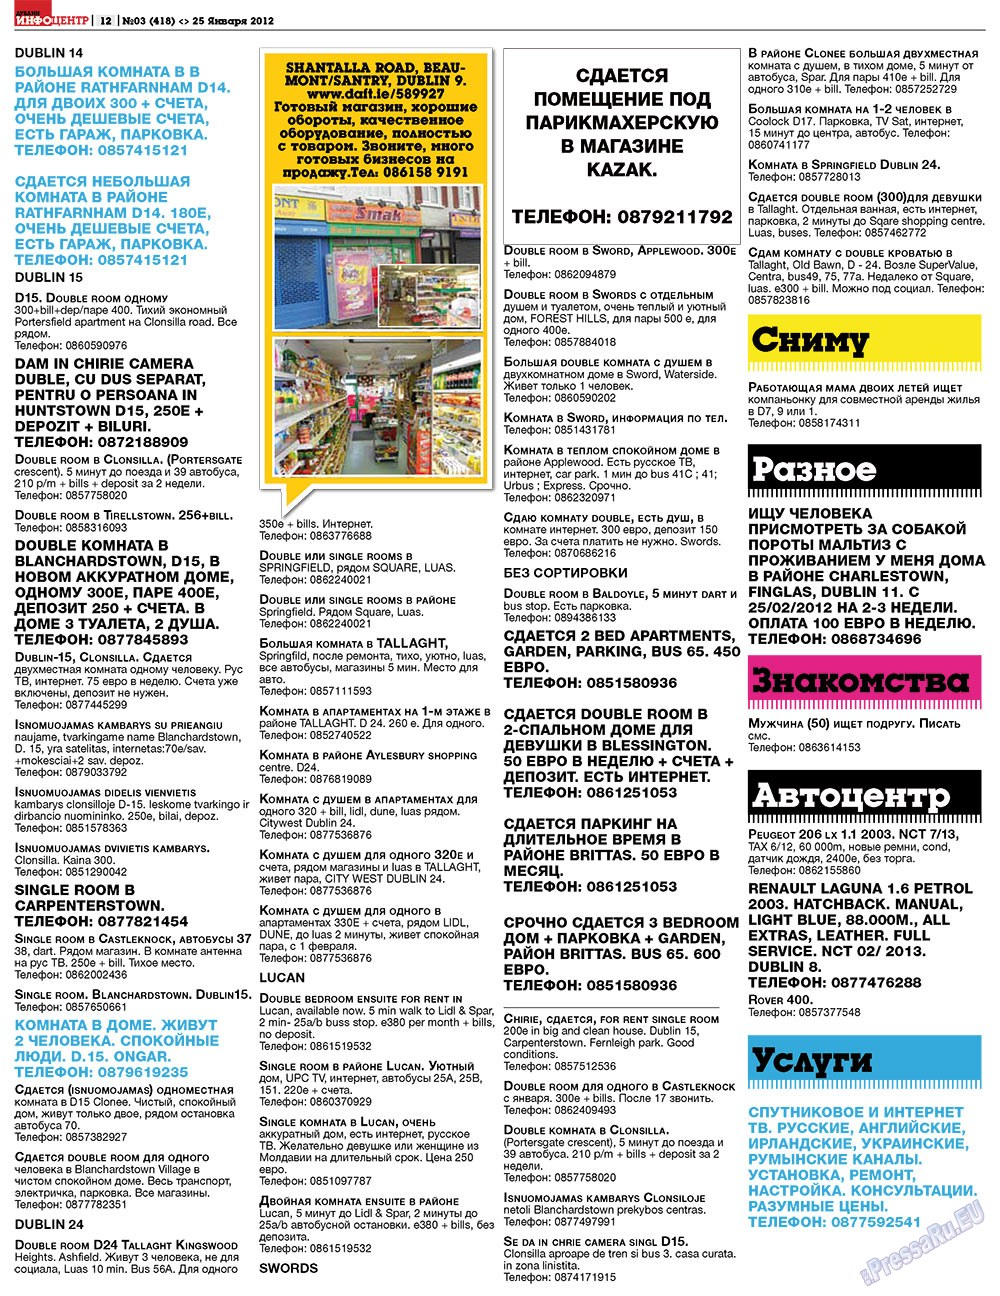 Дублин инфоцентр (газета). 2012 год, номер 3, стр. 12